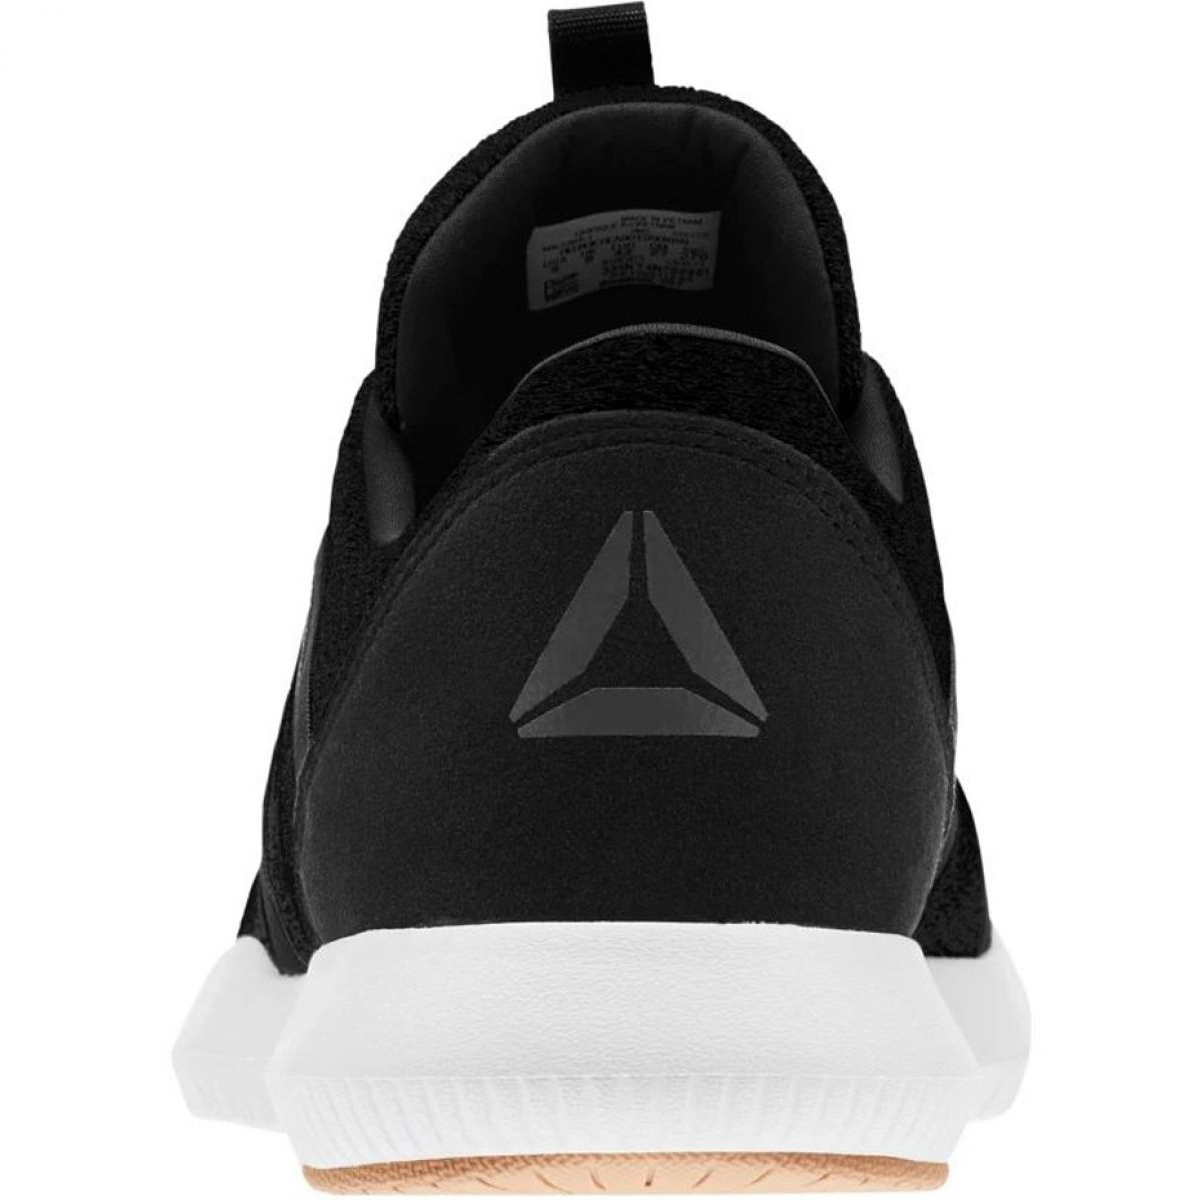 Chaussures-Reebok-Reago-Essential-M-CN4624-noir miniature 5